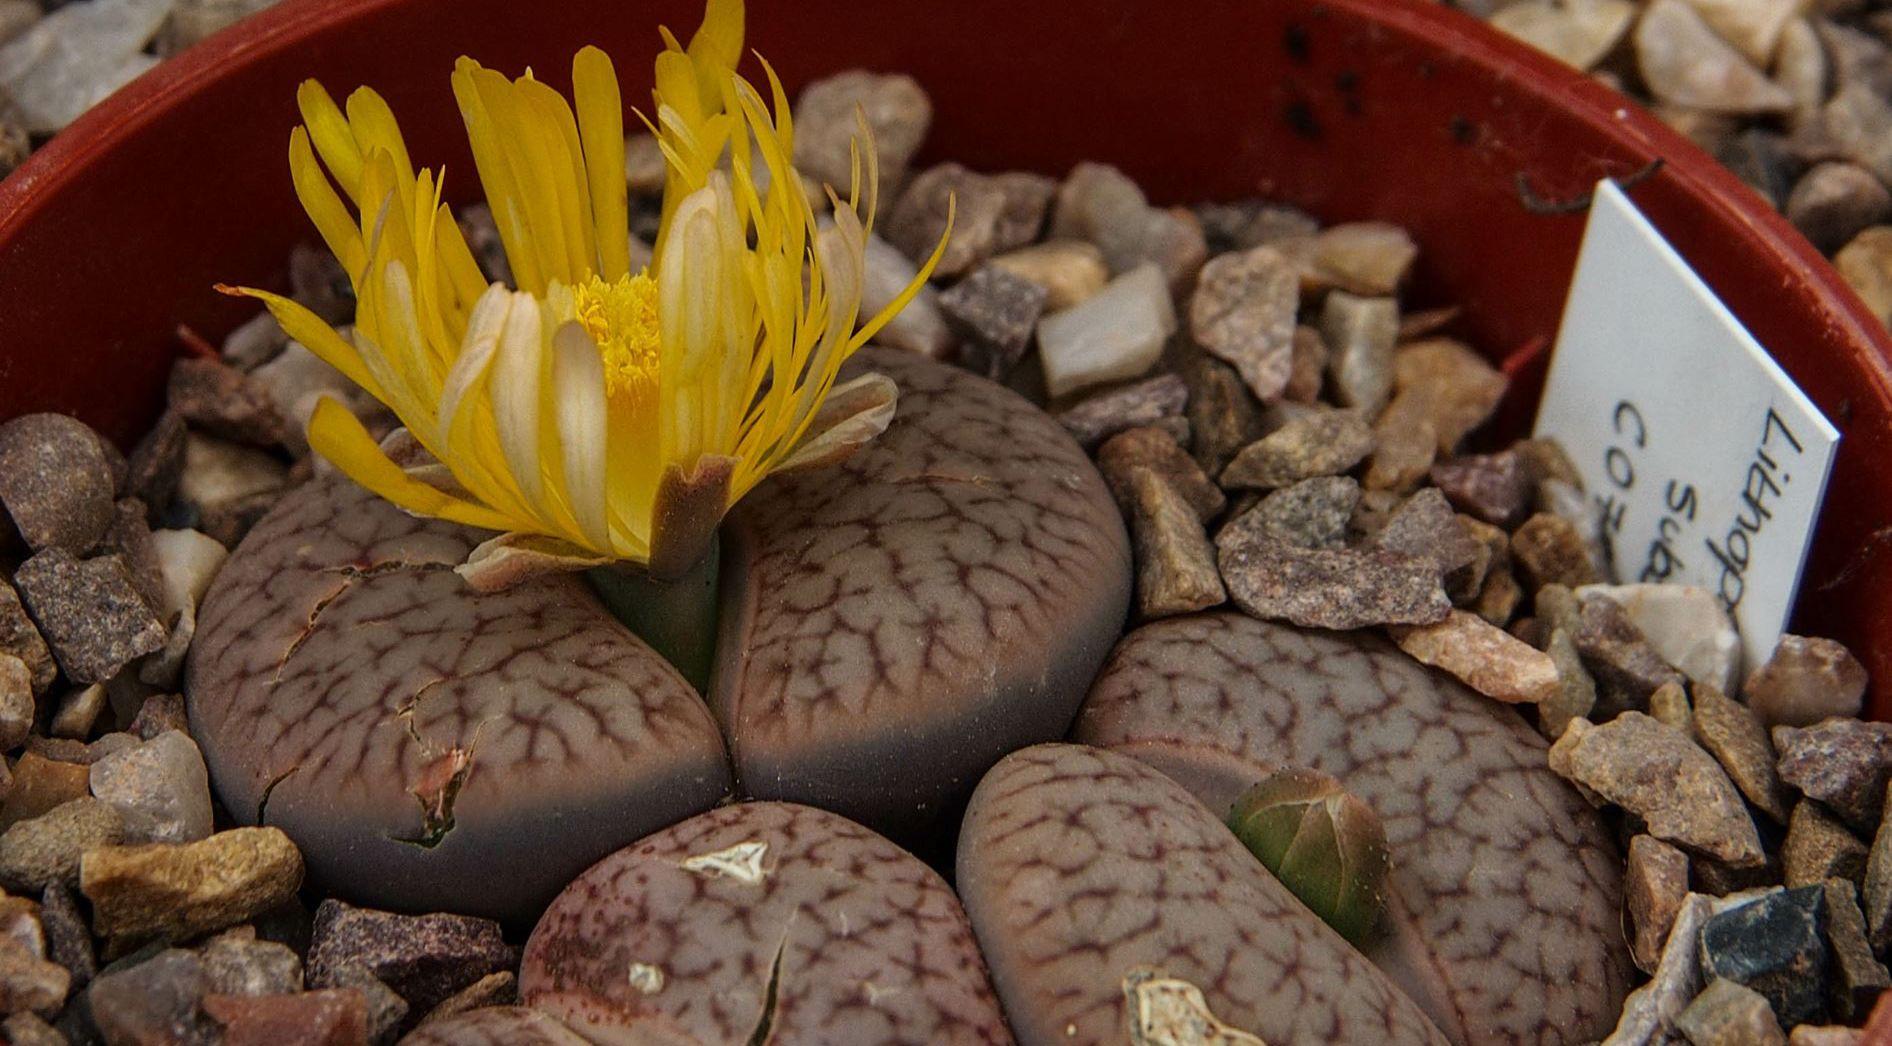 Lithops pseudotruncatella subsp. Dendritica at the Cambridge University Botanic Garden